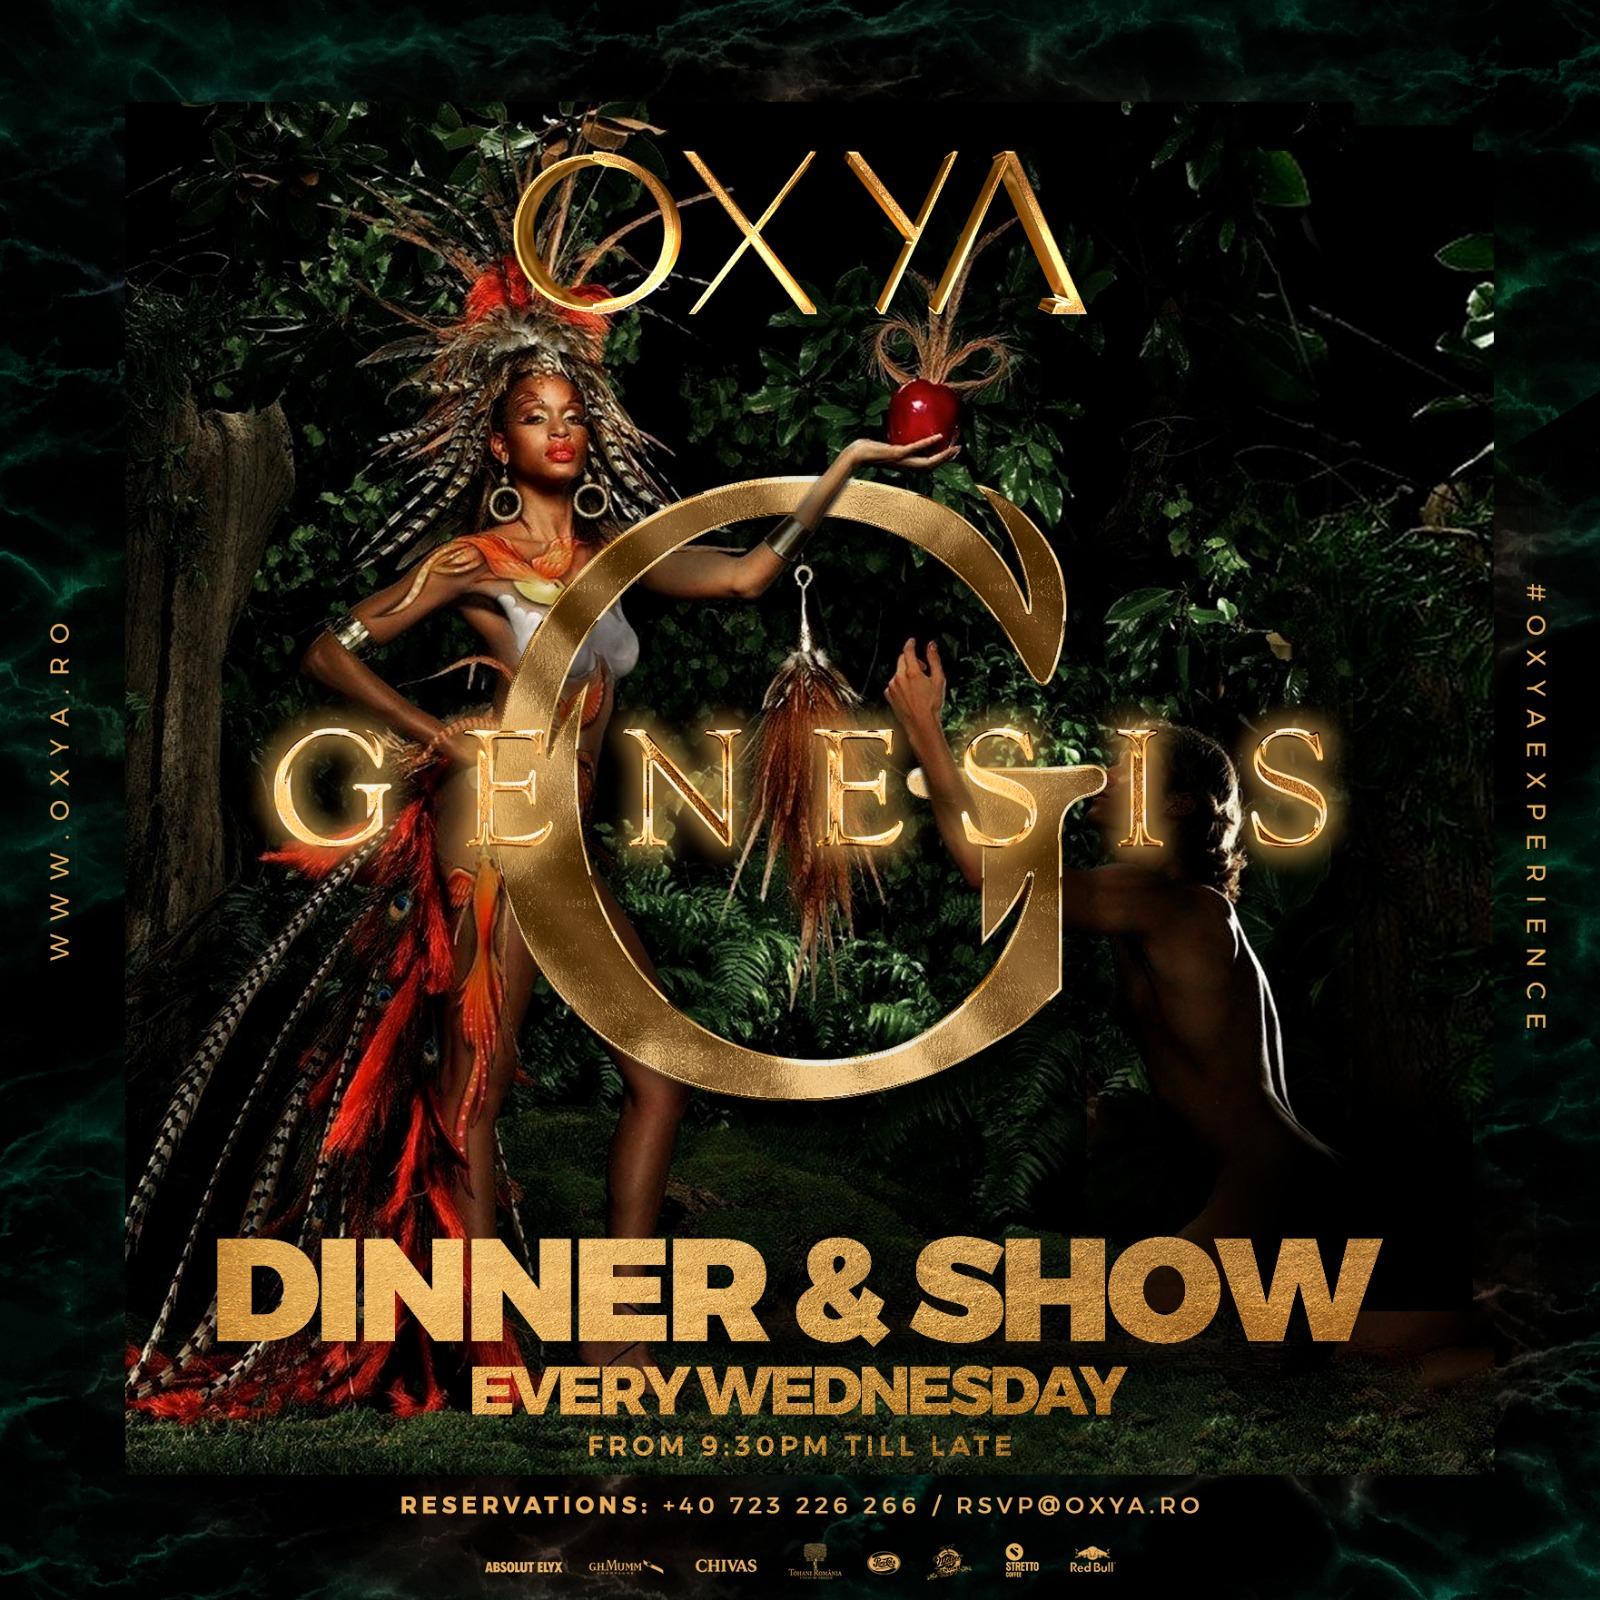 Genesis Dinner Show at OXYA